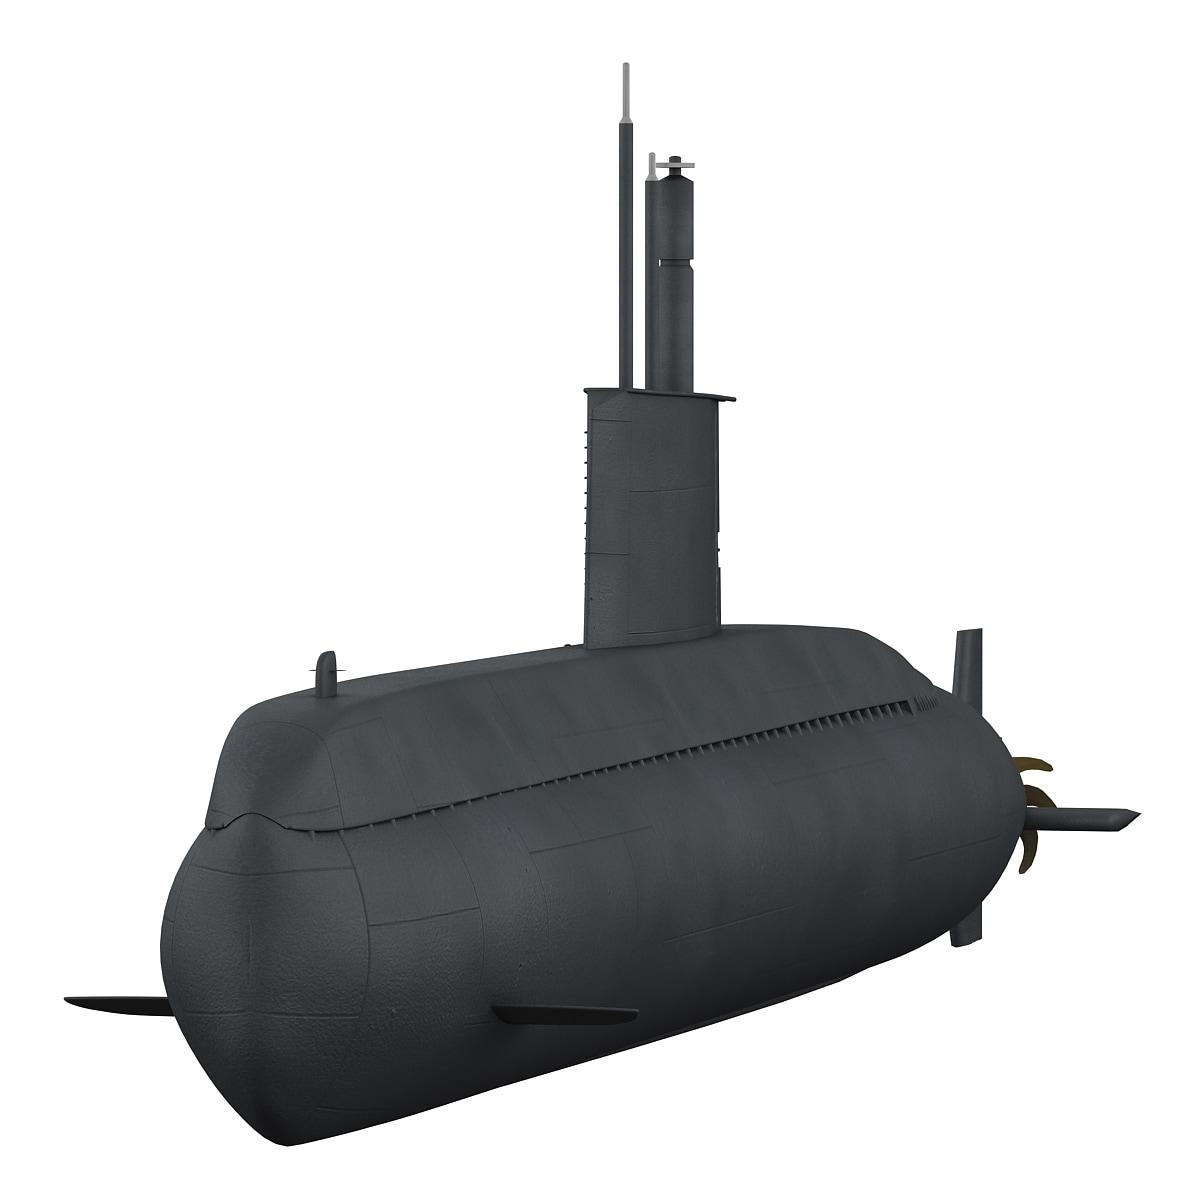 Type_209_Preveze_Class_Turkish_Navy_Submarine_001.jpg